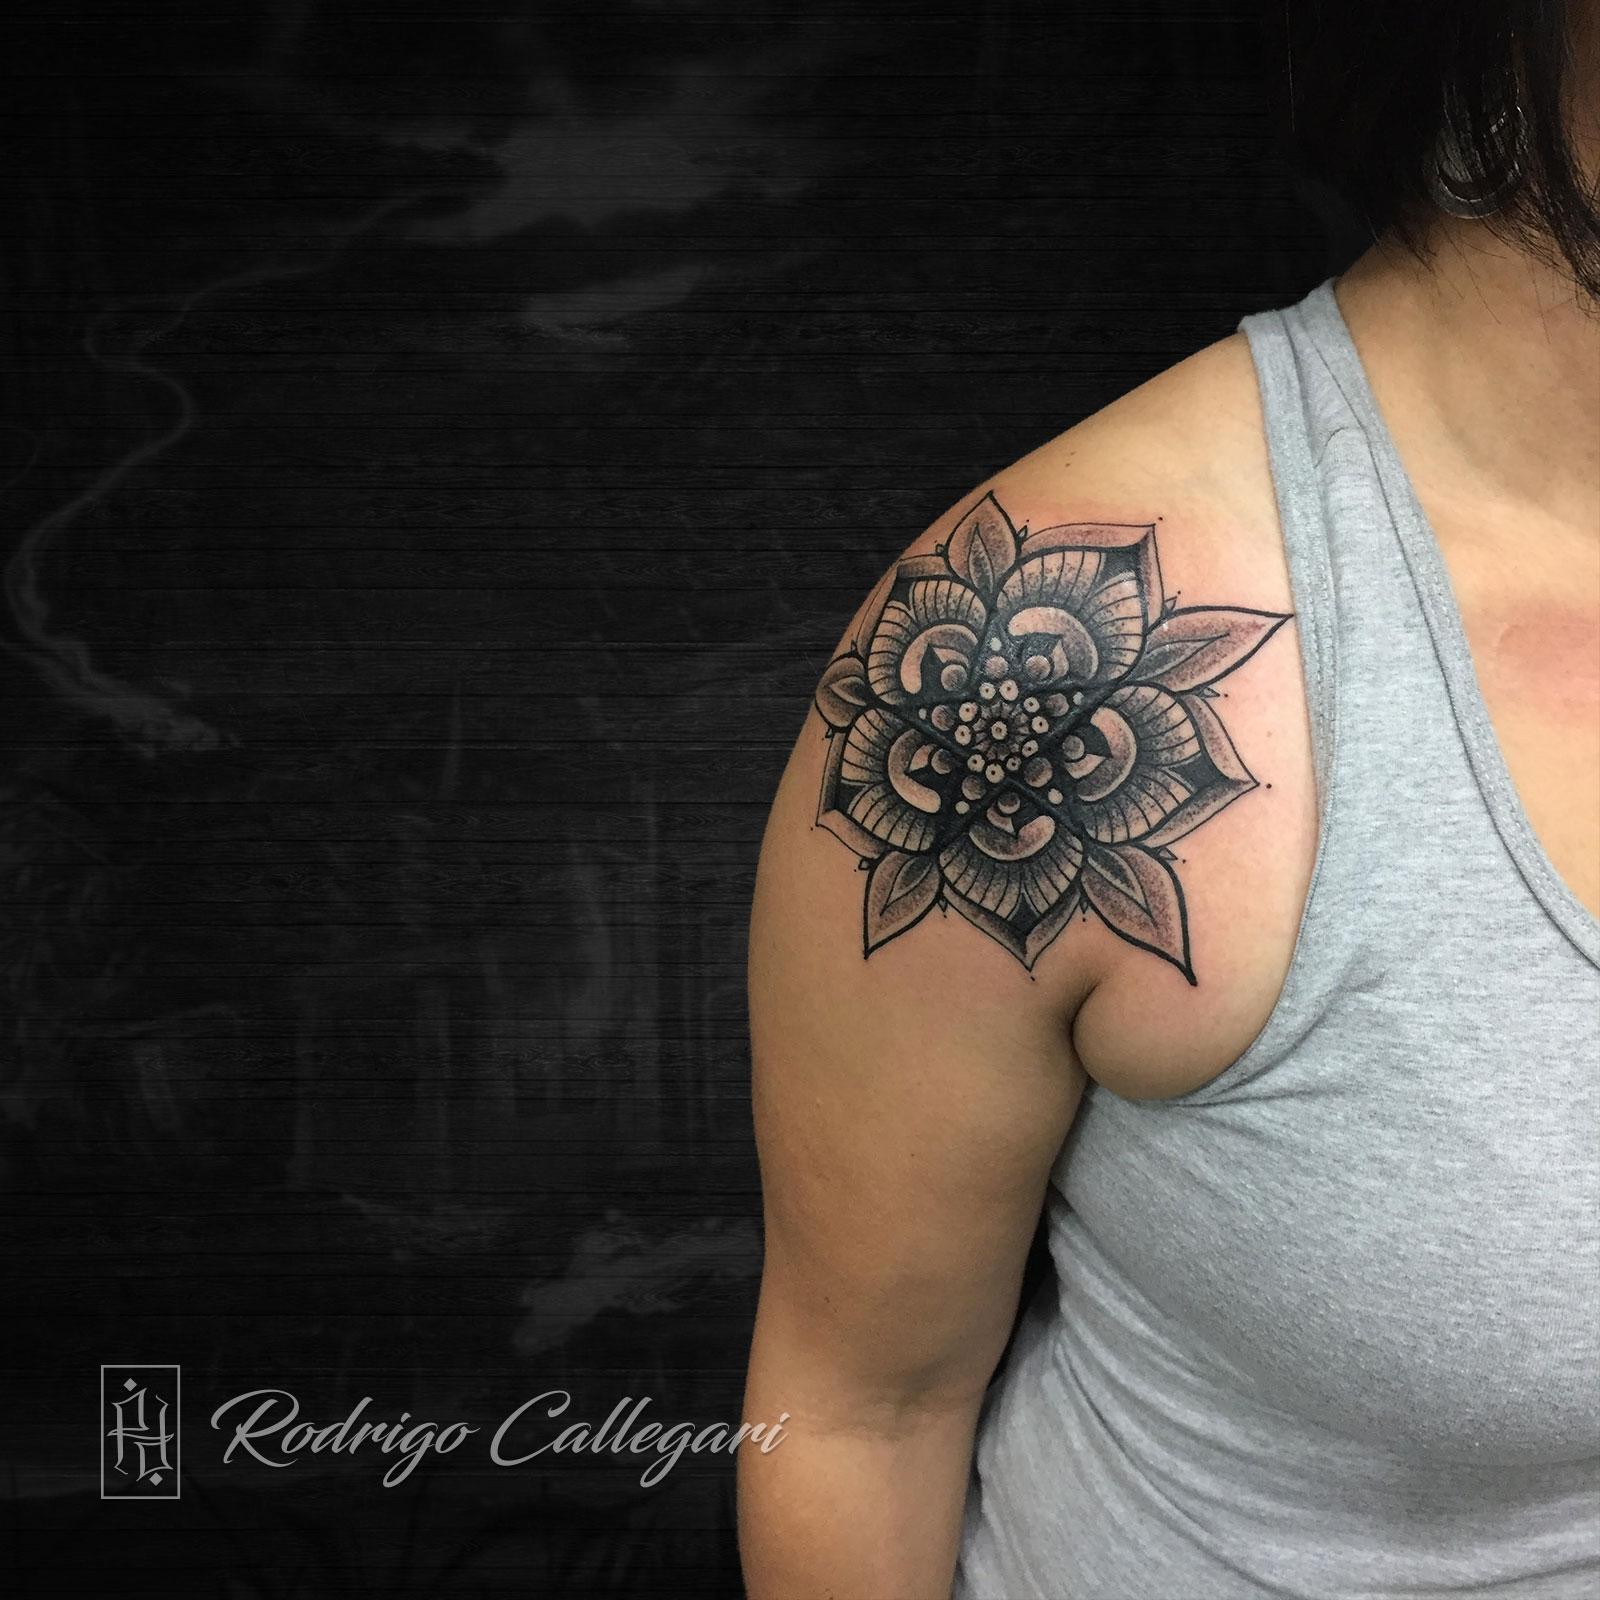 Other Styles - Rodrigo Callegari Tattoo - Estúdio de Tatuagem na Zona Sul de SP